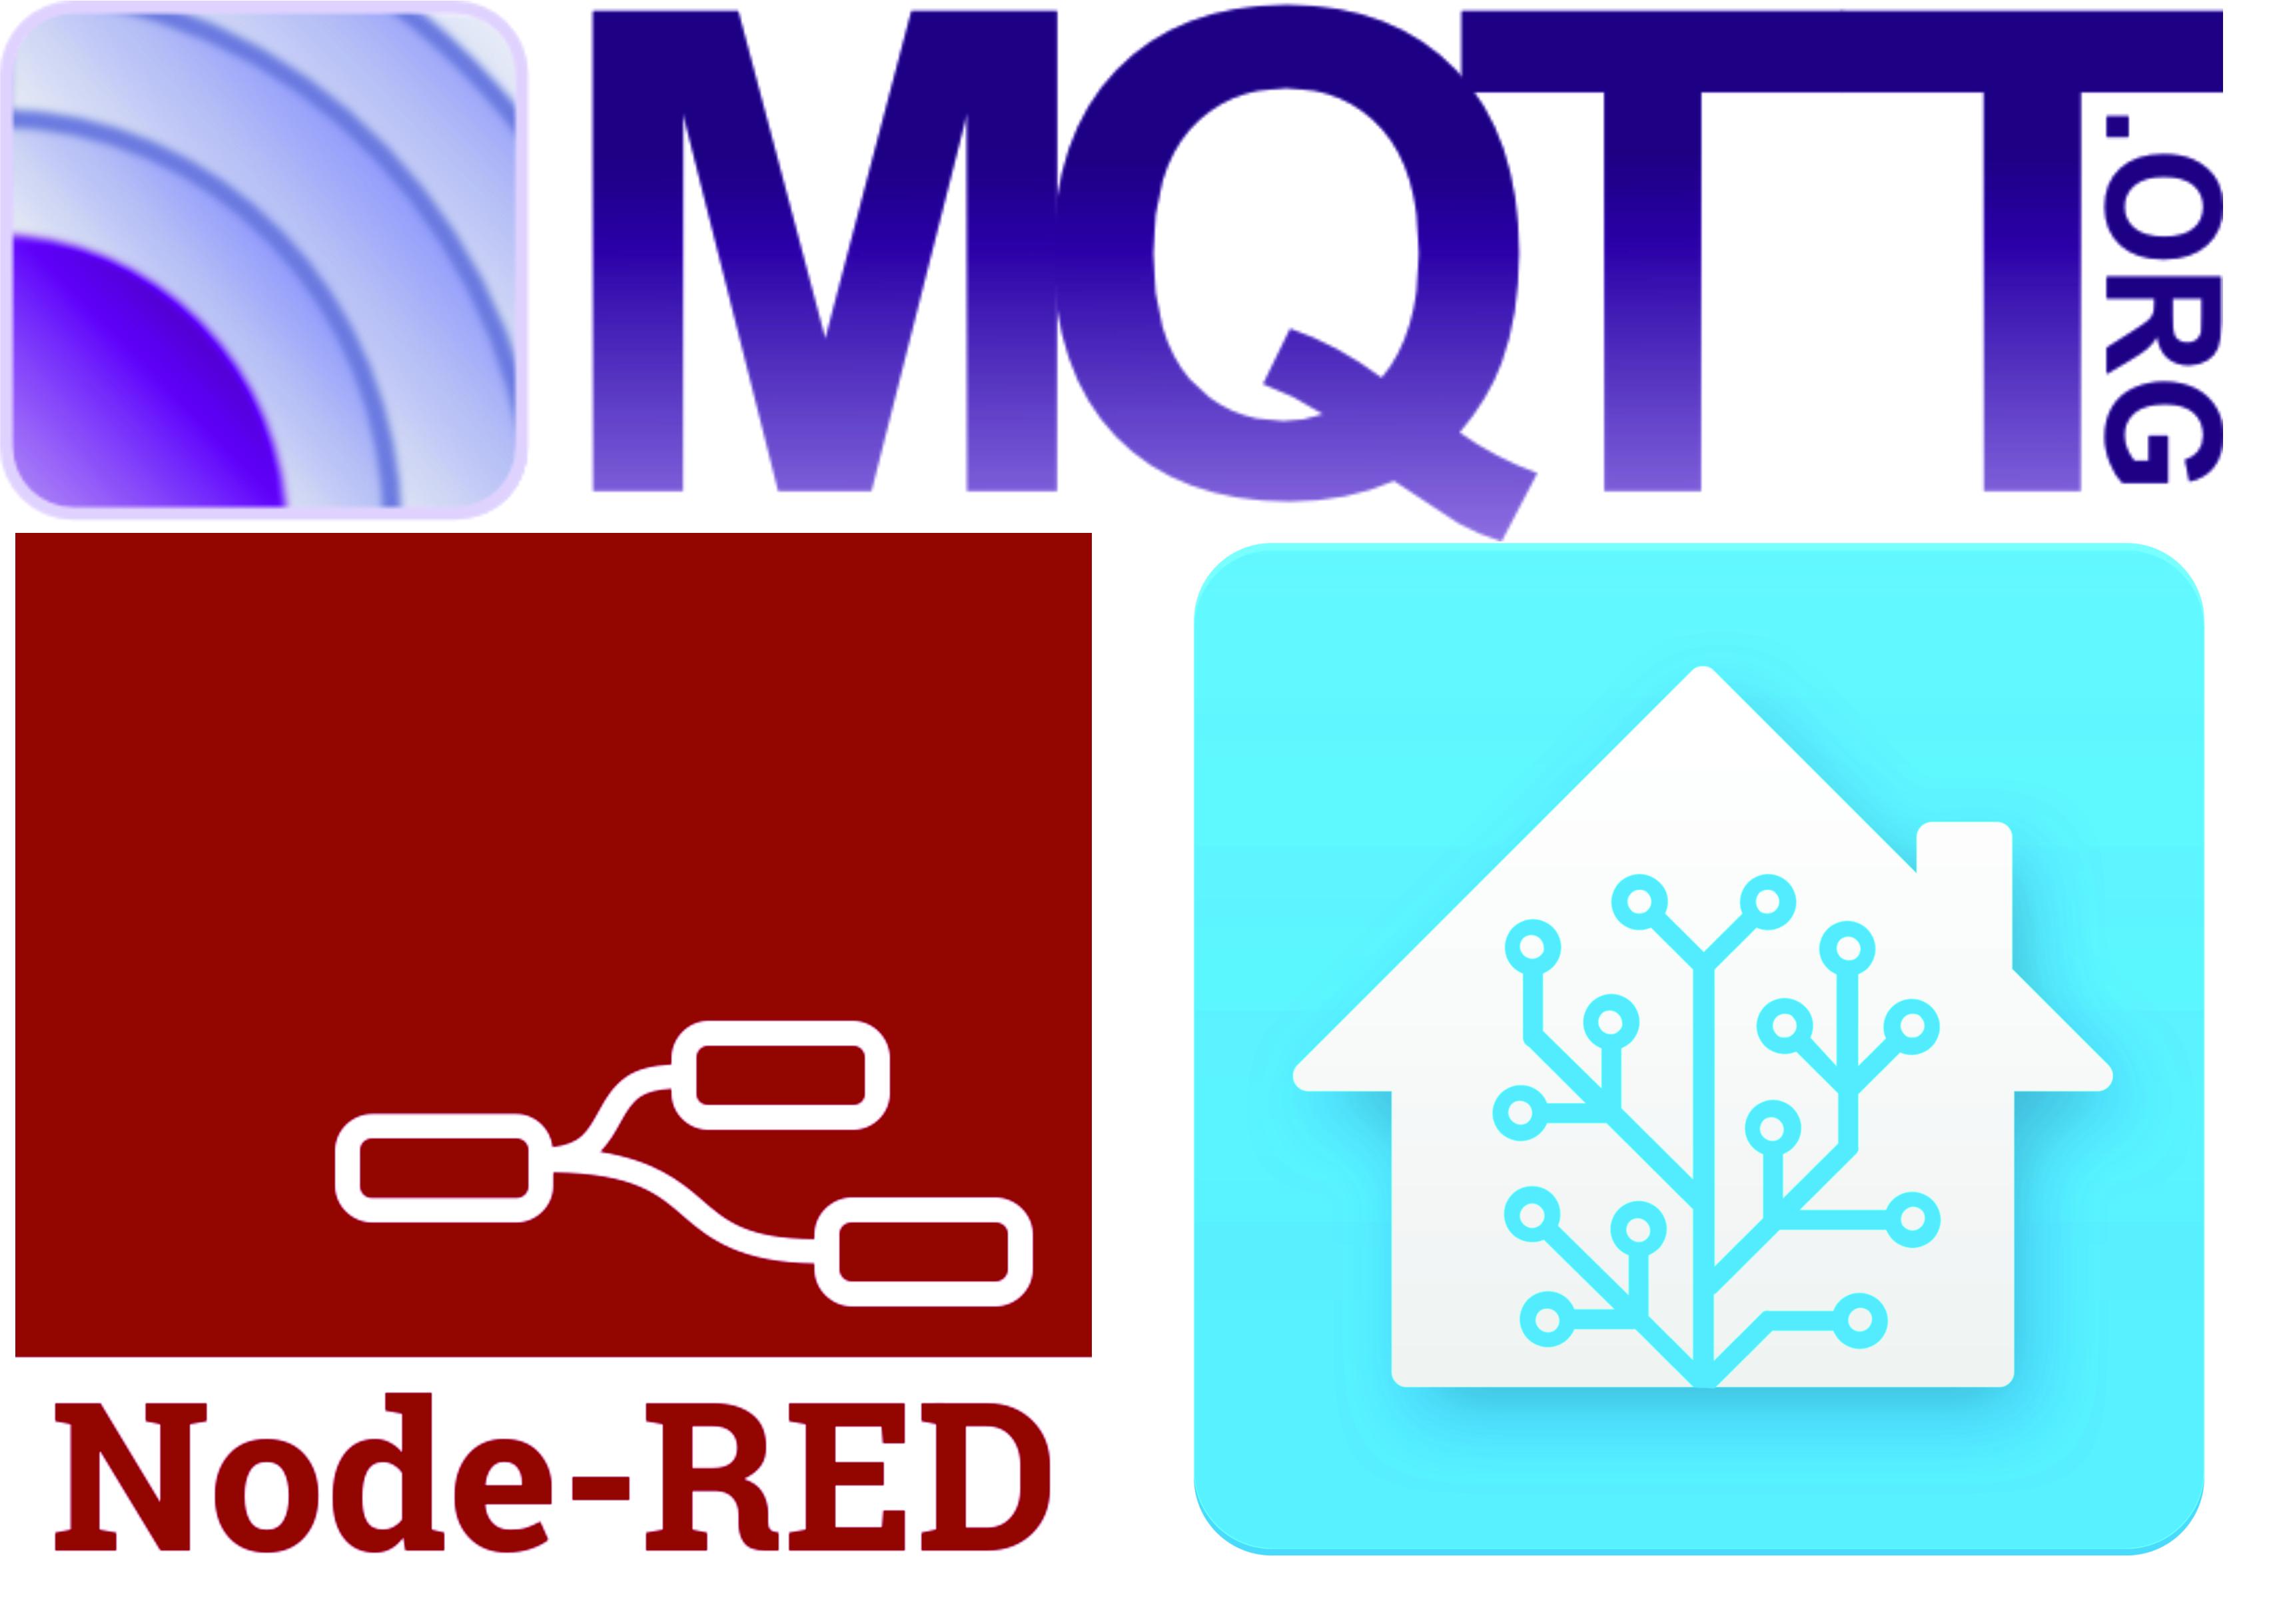 Installare MQTT e Node-red su Hassbian